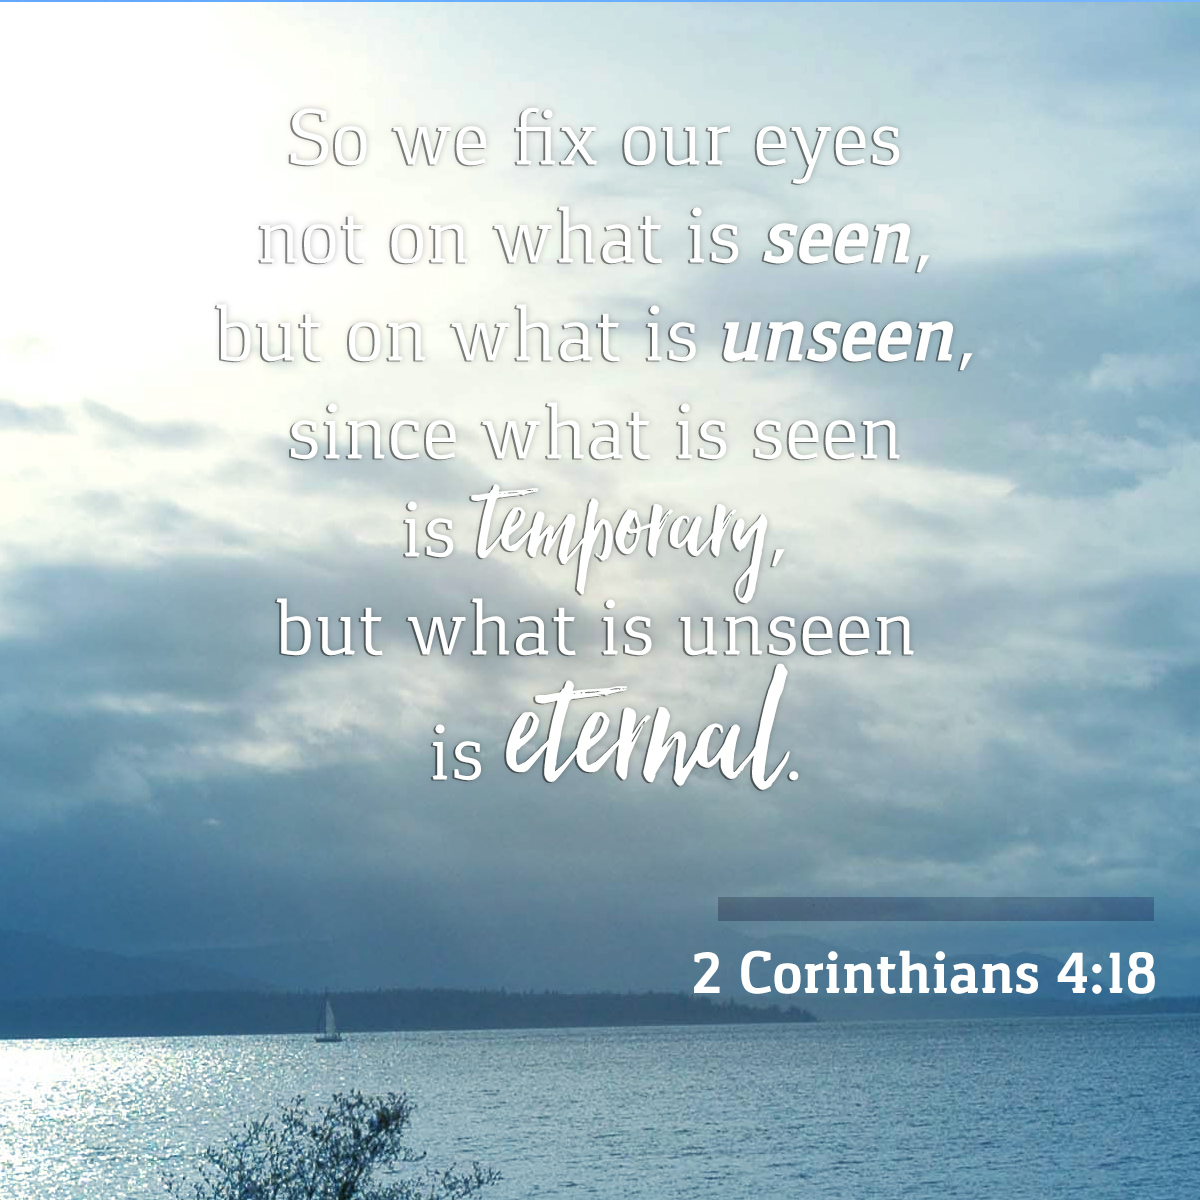 Daily Verse - 2 Corinthians 4:18